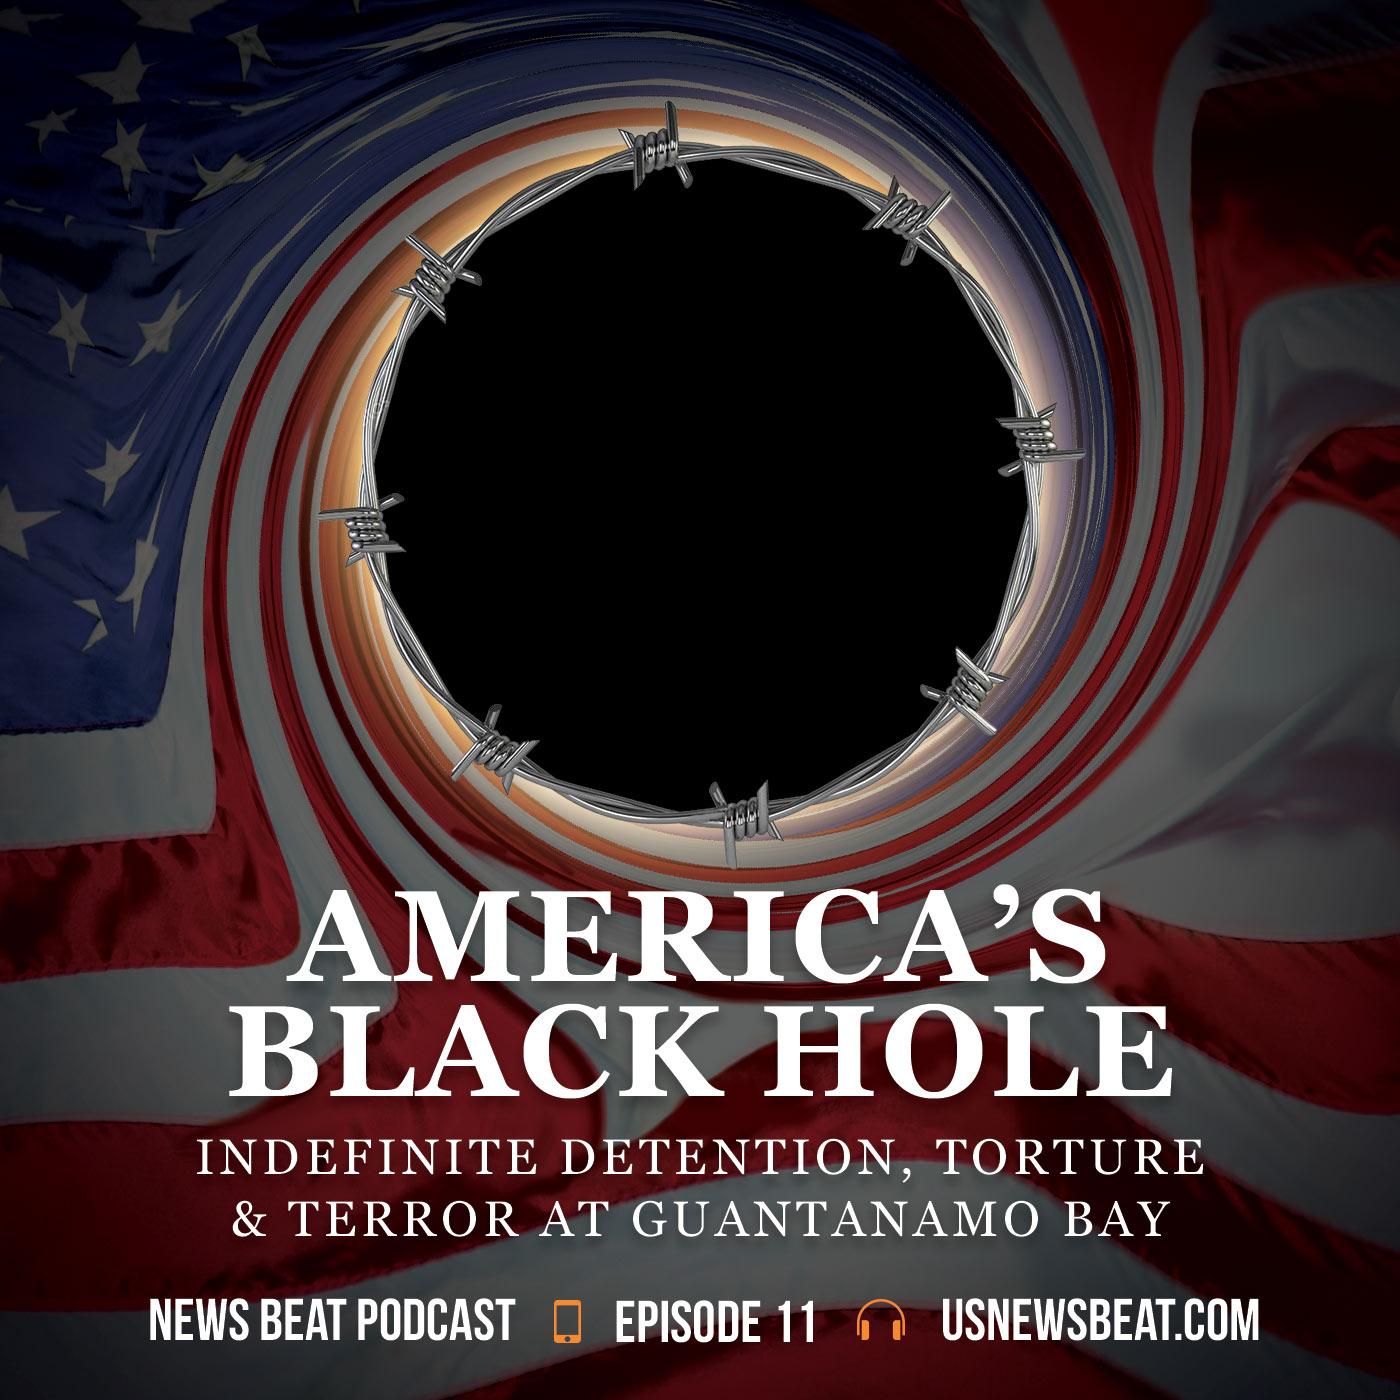 America's Black Hole